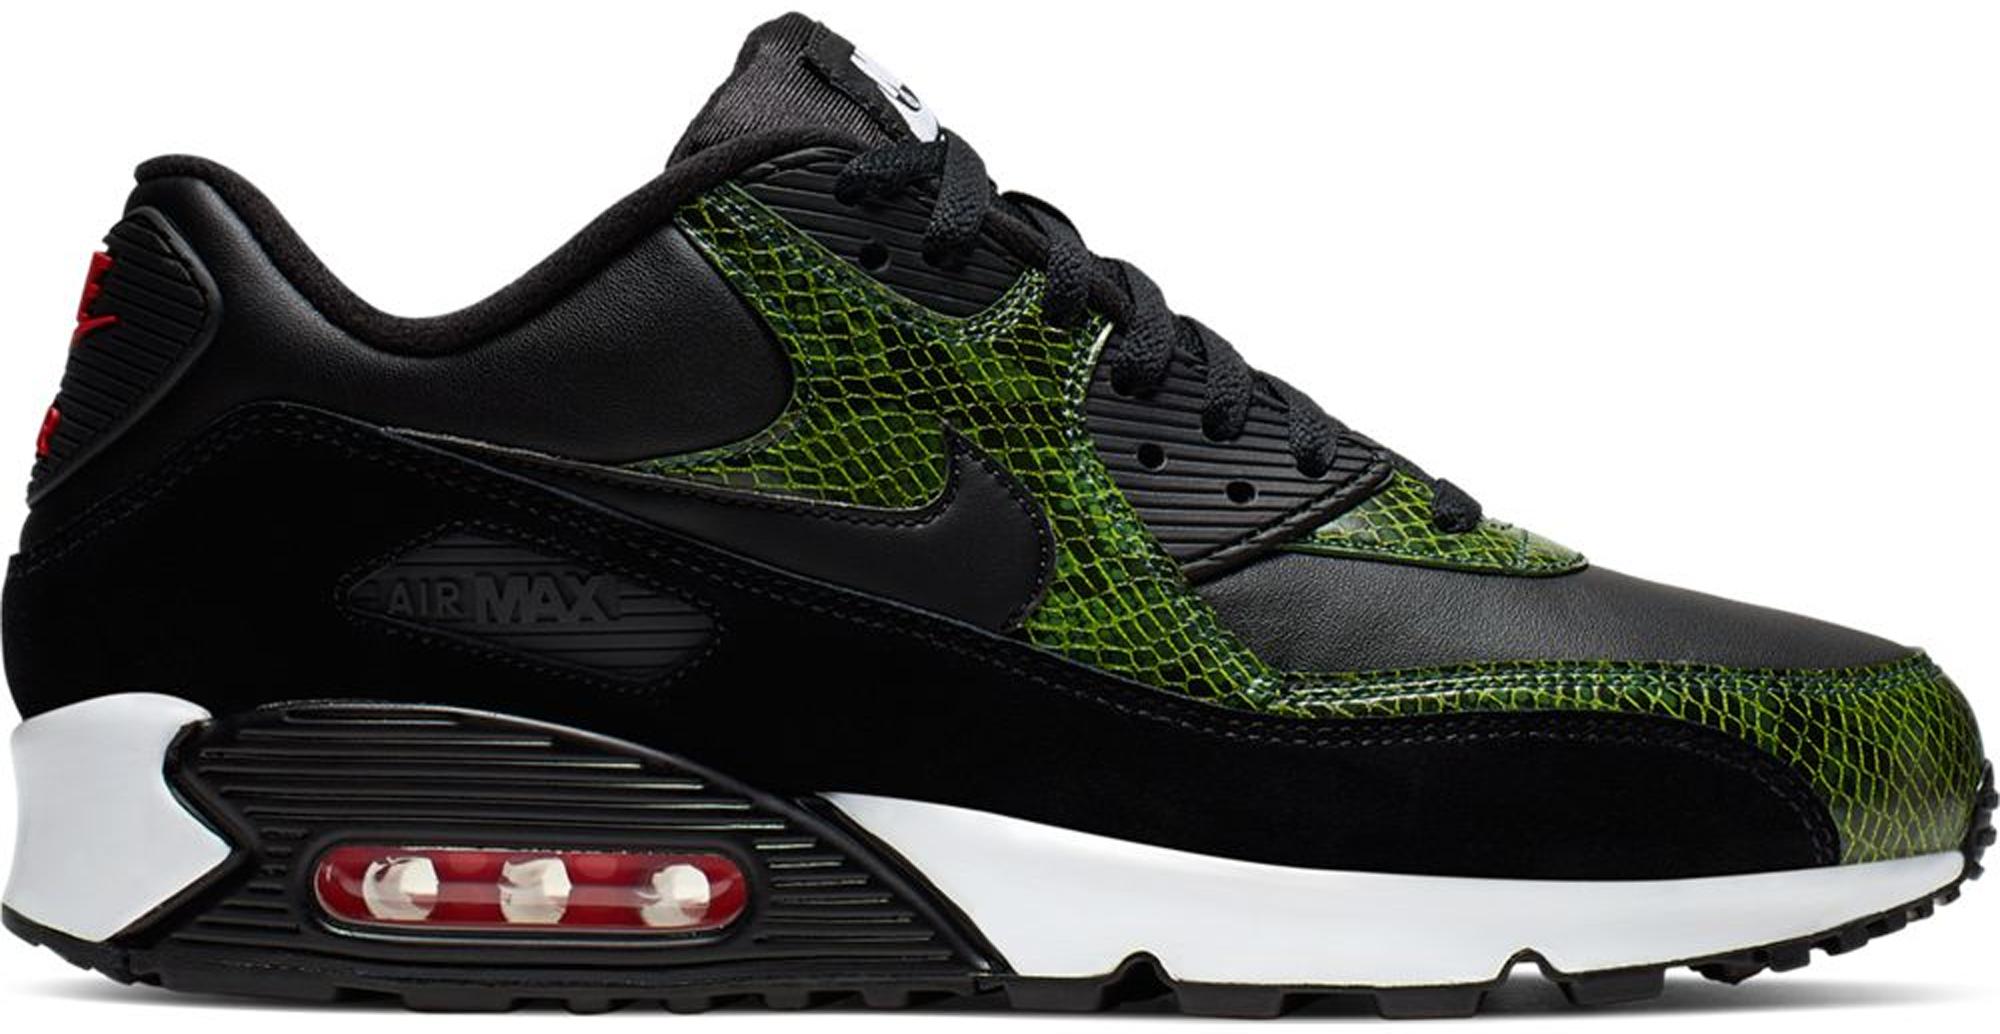 Nike Air Max 90 Green Python - CD0916-001